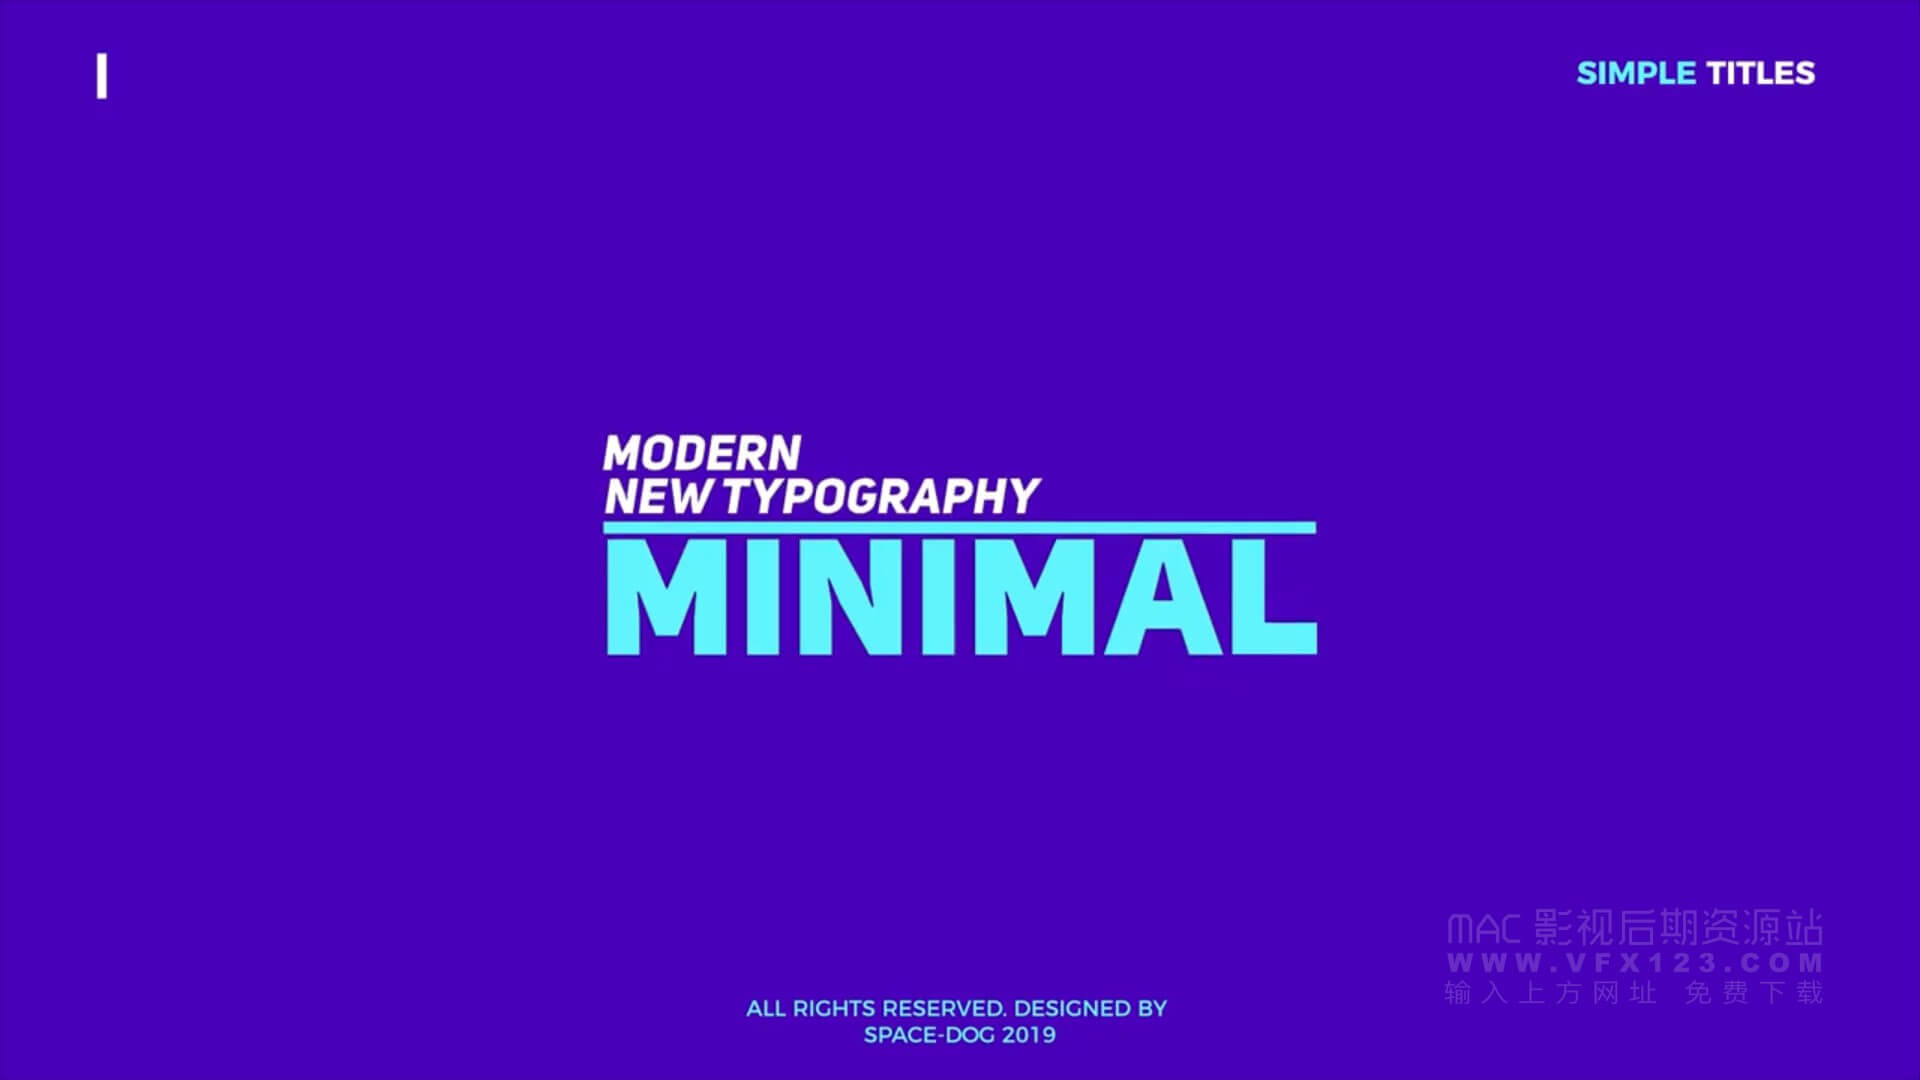 Fcpx插件 25个现代时尚简洁文字标题设计排版动画 Simple Titles | MAC影视后期资源站